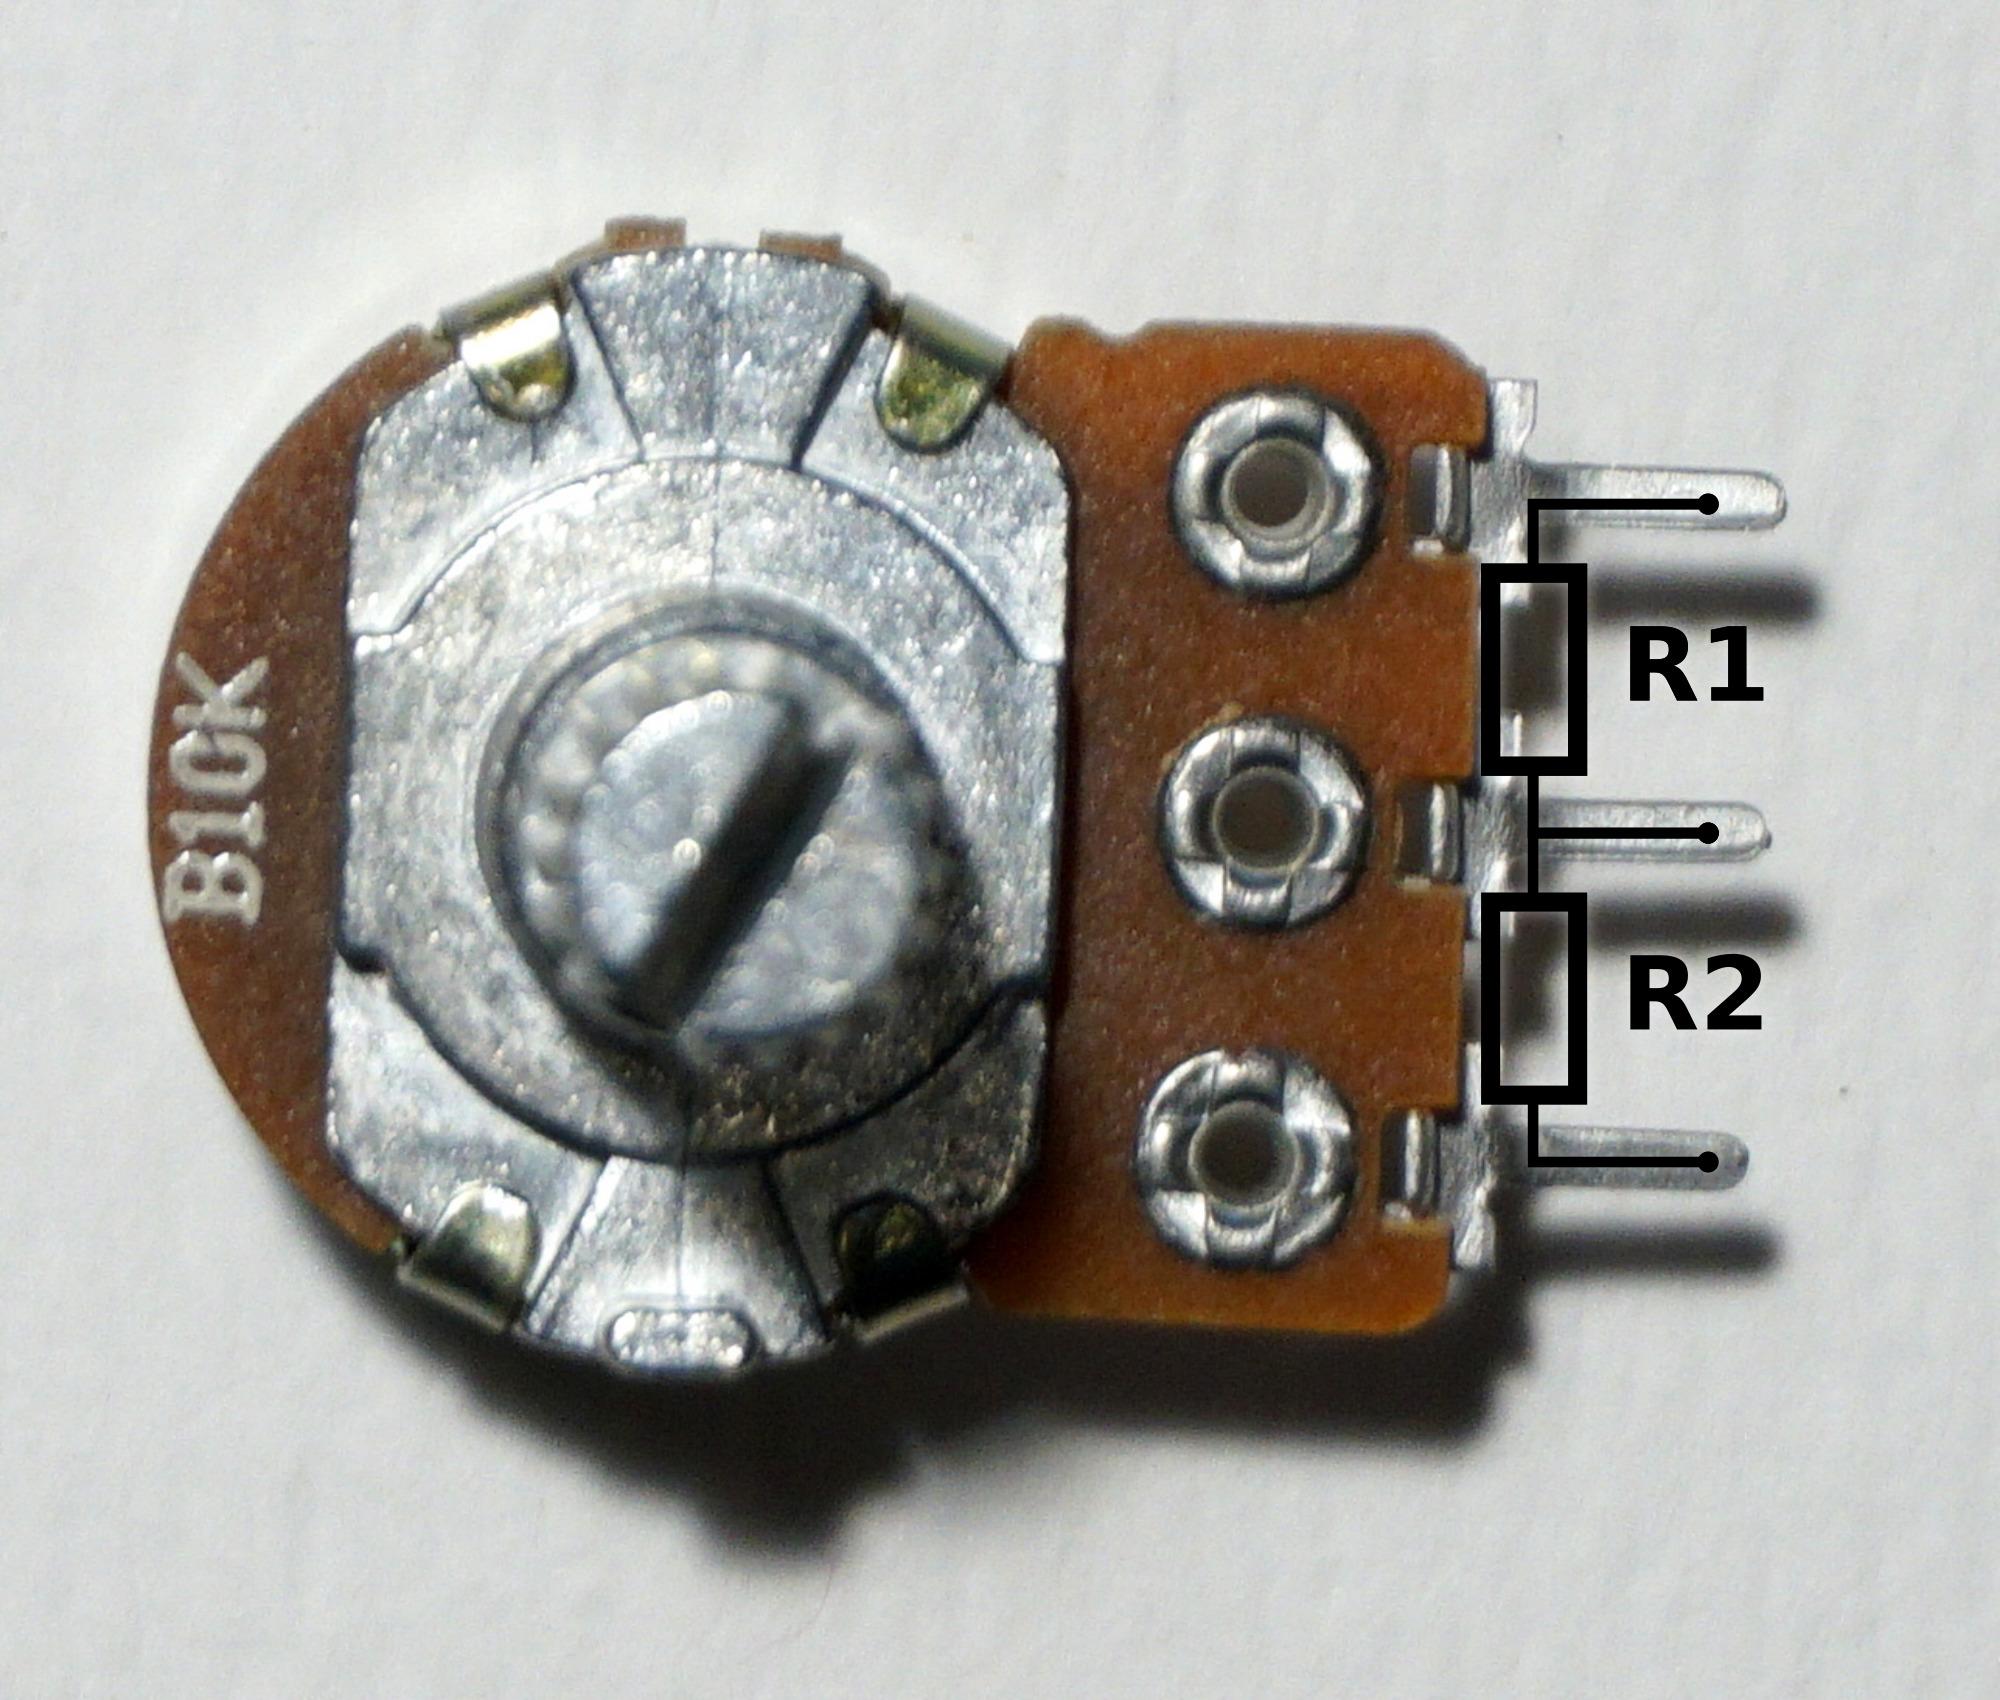 circuitpython_pot_labels.jpg